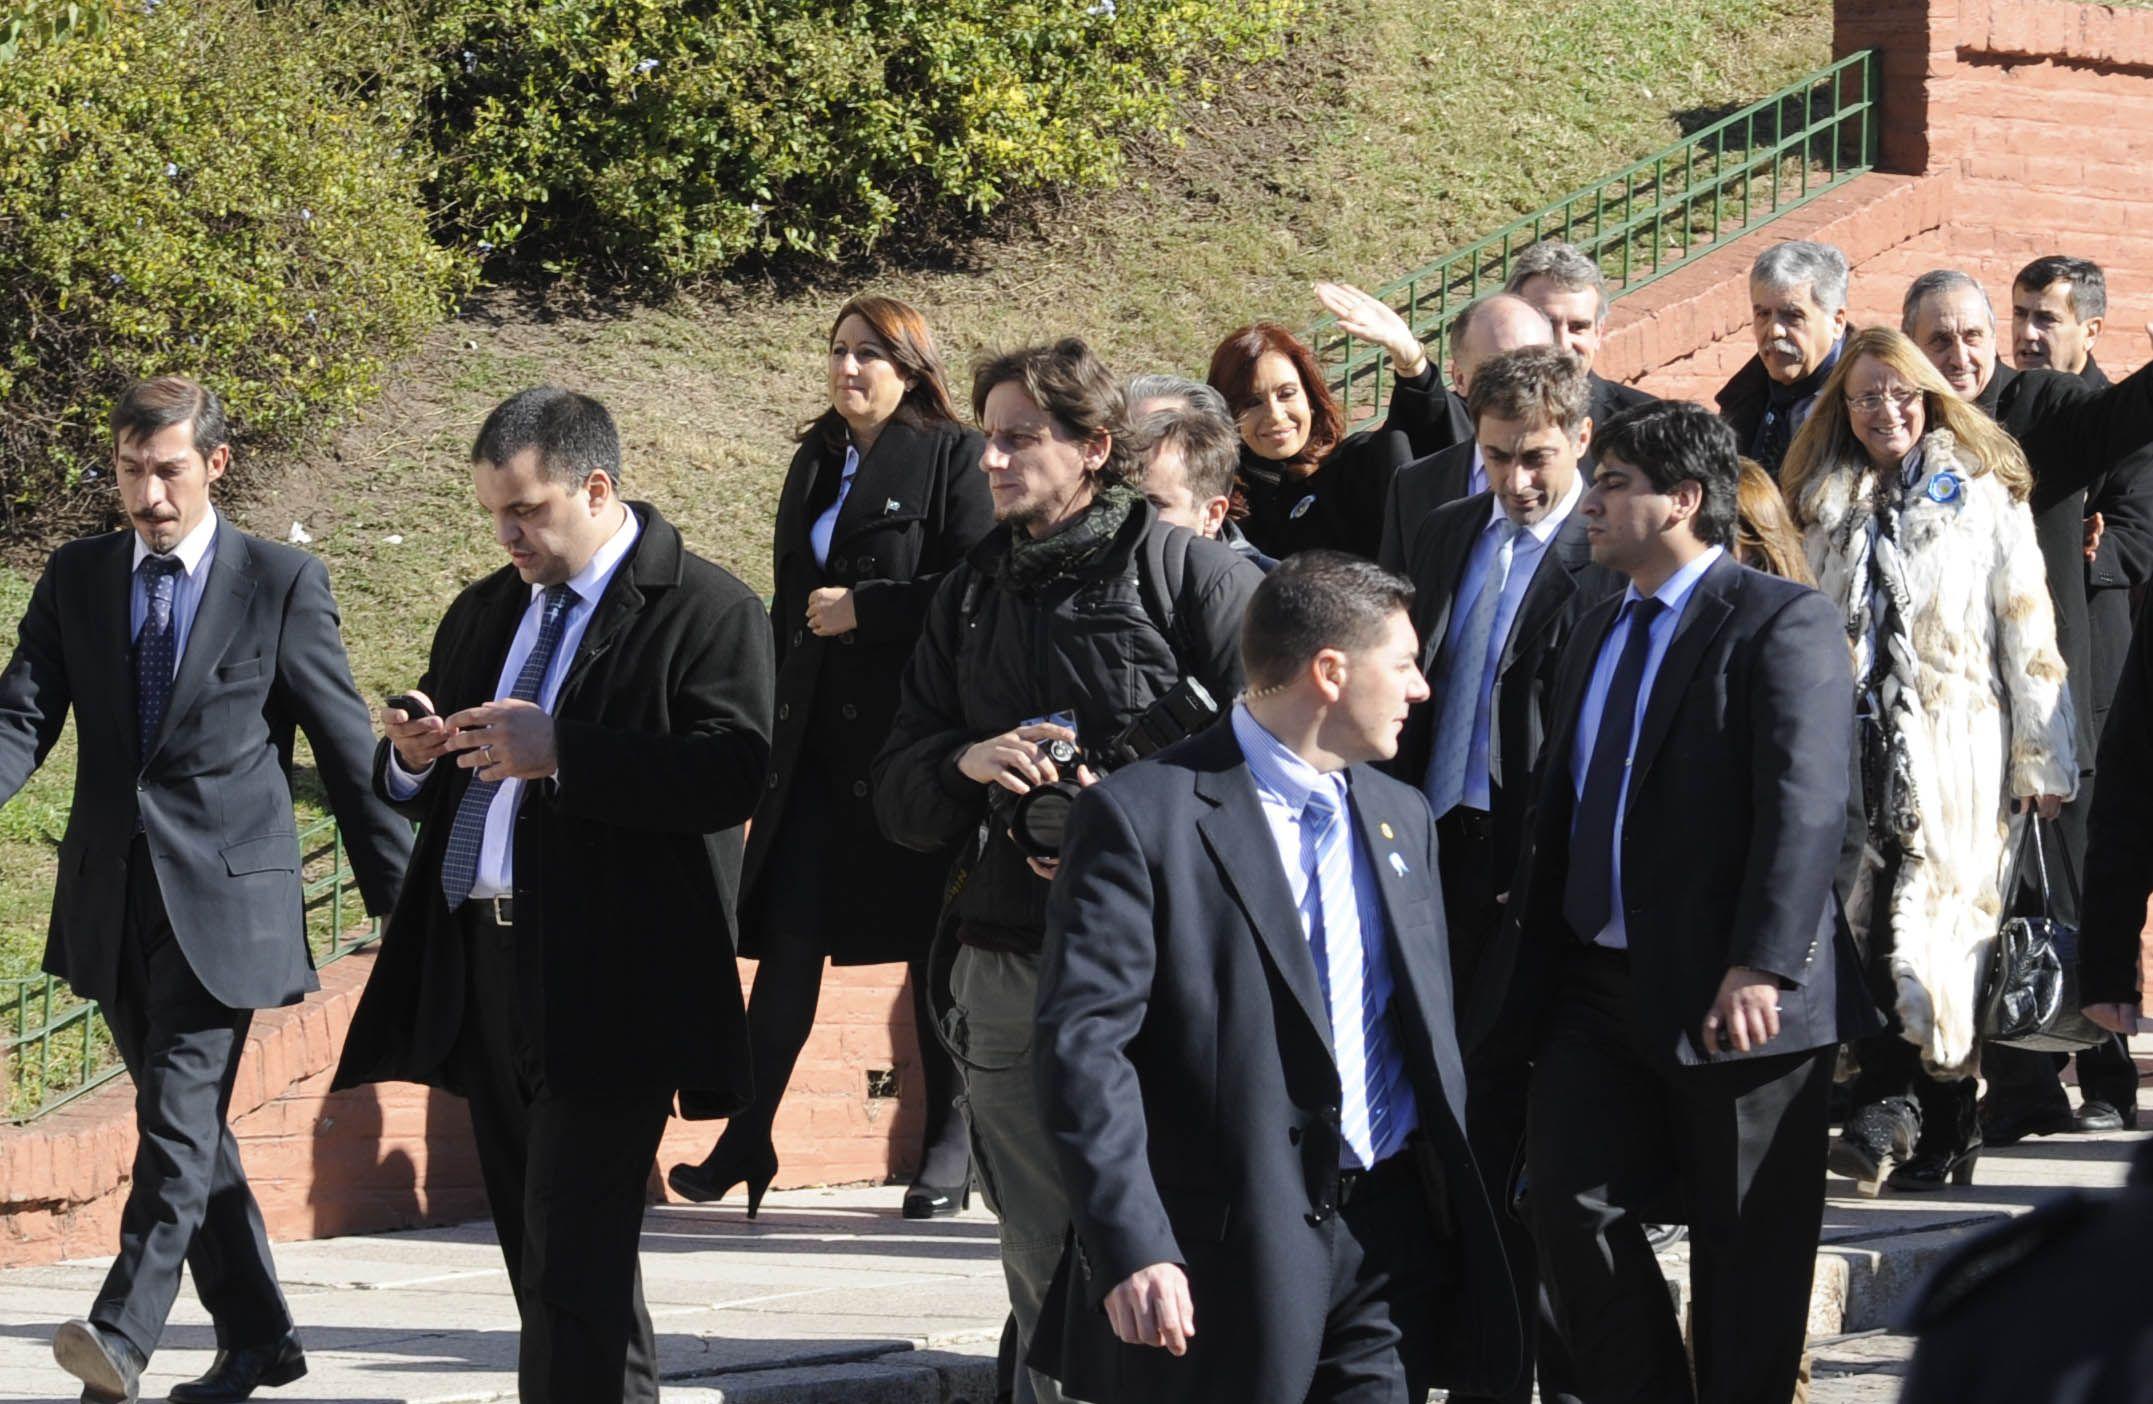 En compañía de la intendenta Mónica Fein y del vicegobernador Jorge Henn